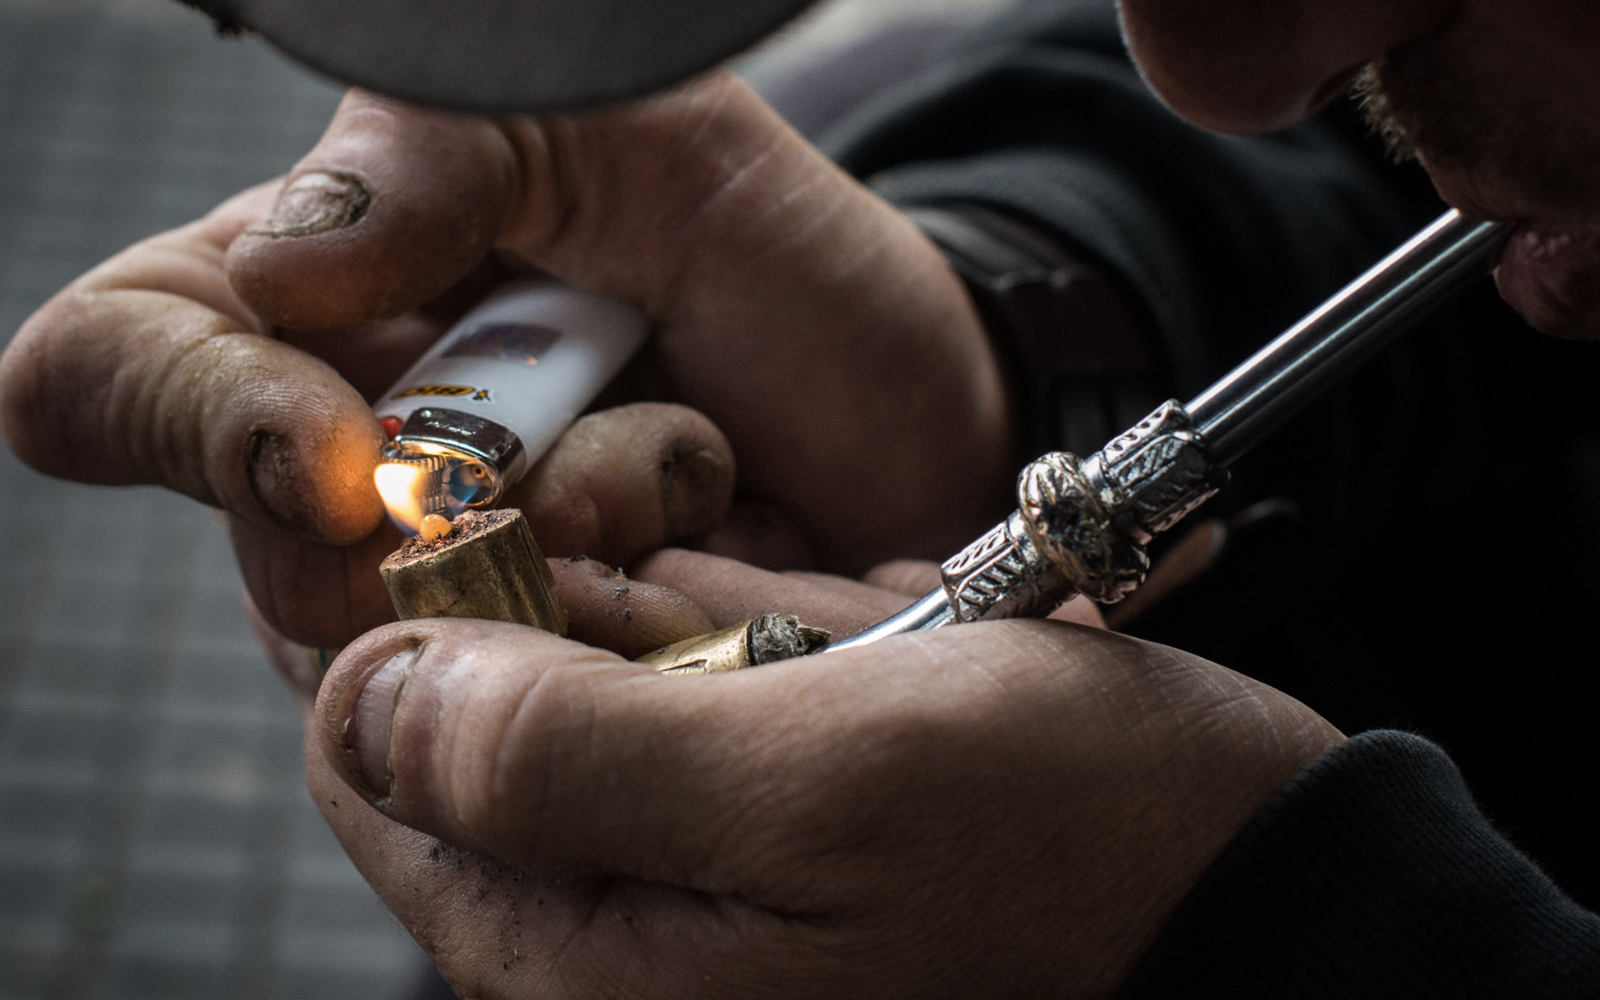 héroïne Addict site de rencontre Wedgwood Jasper datant